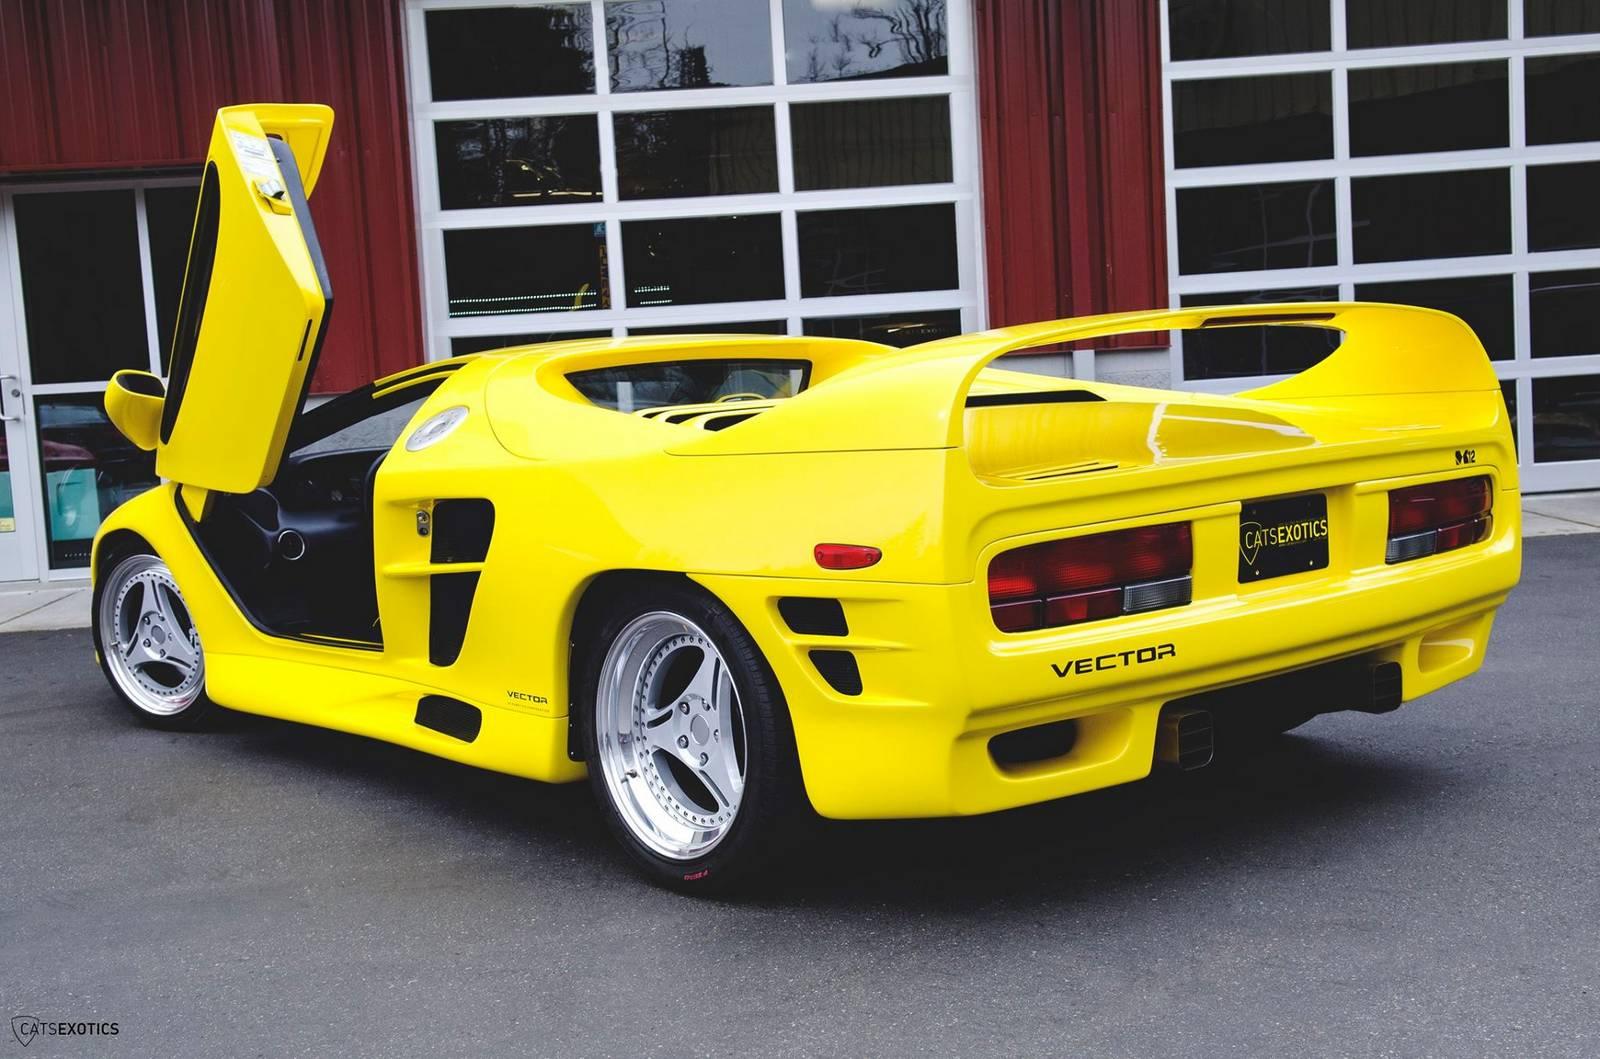 Rare Vector M12 For Sale at Cats Exotics - GTspirit